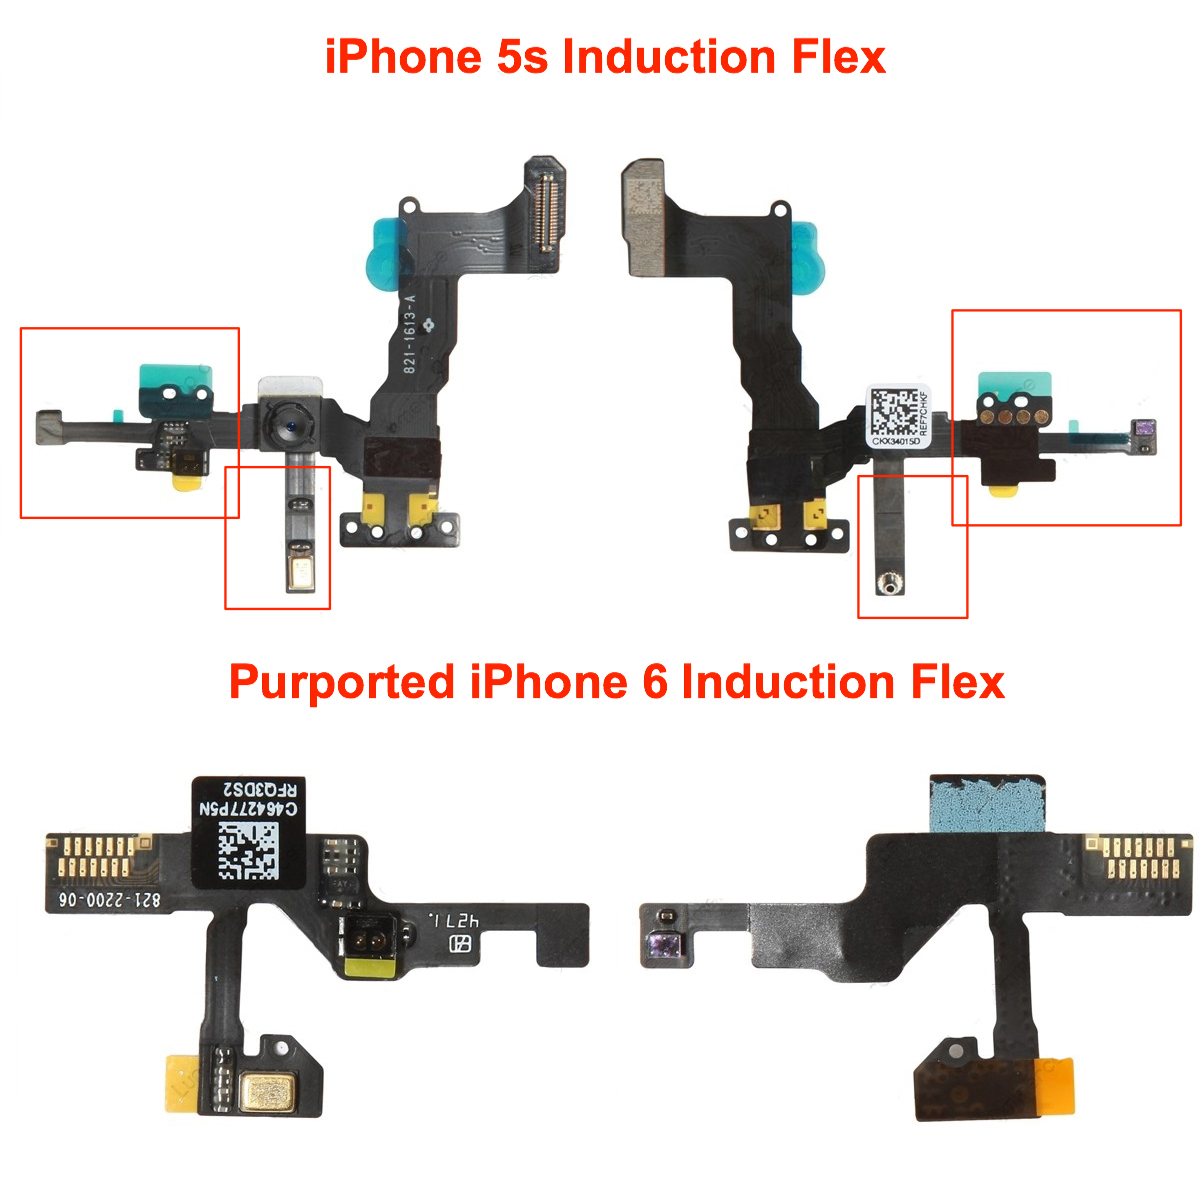 iPhone-6-Induction-Flex